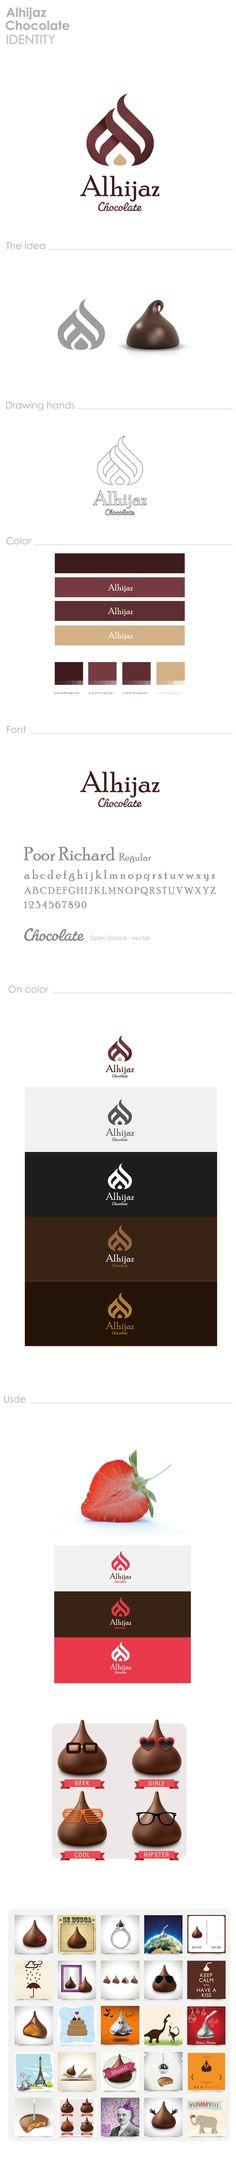 Alhijaz Chocolate by Ahmad Nabil, via Behance